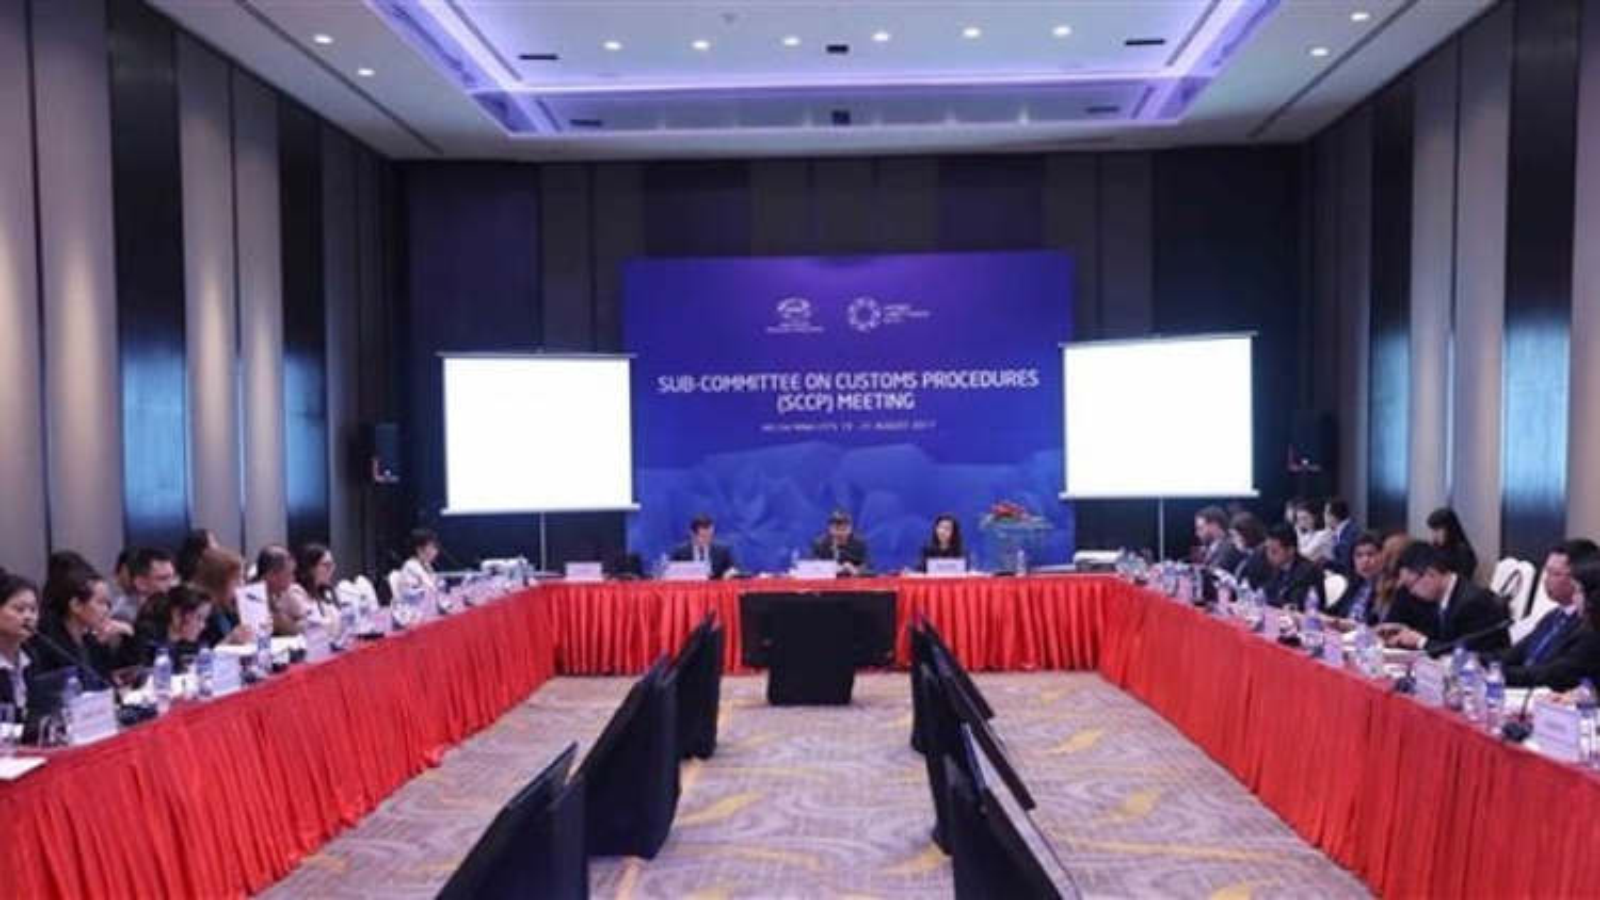 APEC Sub-Committee on Customs Procedures meets in HCM City